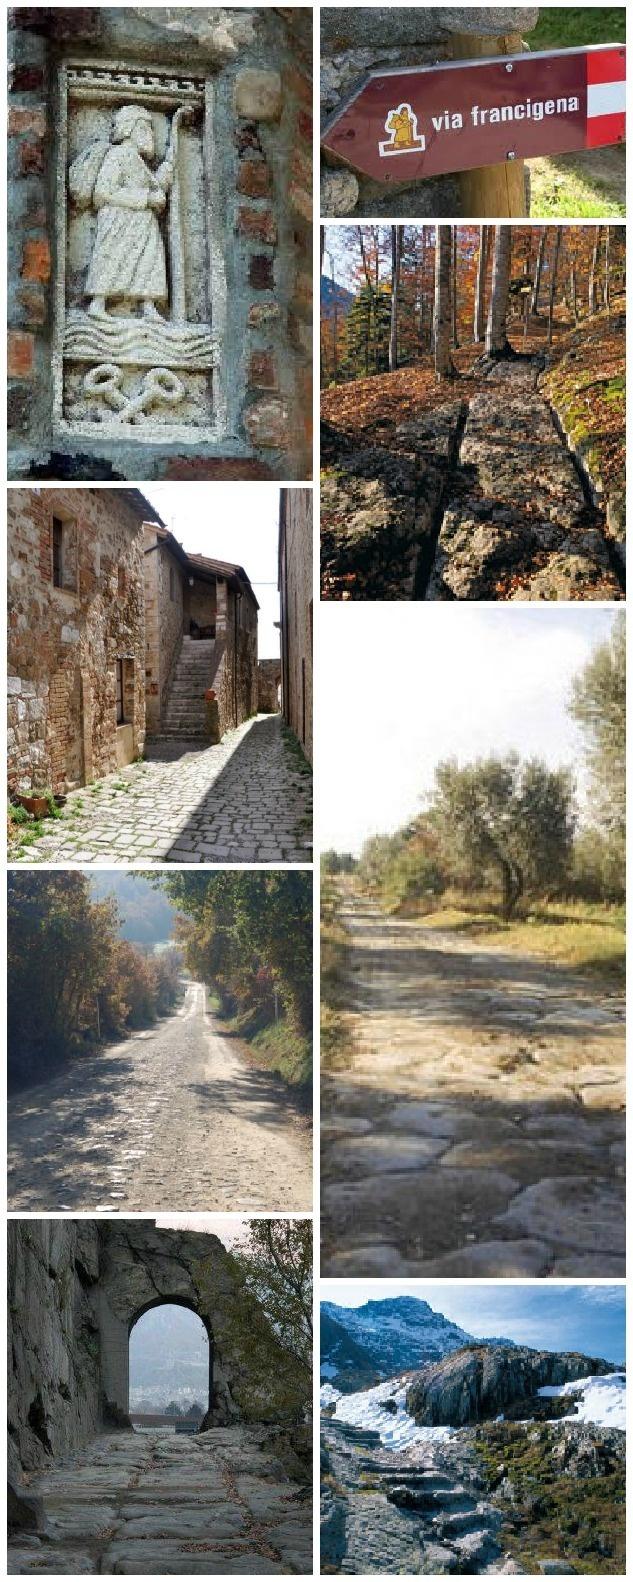 Via Francigena and the Sigeric's itinerary